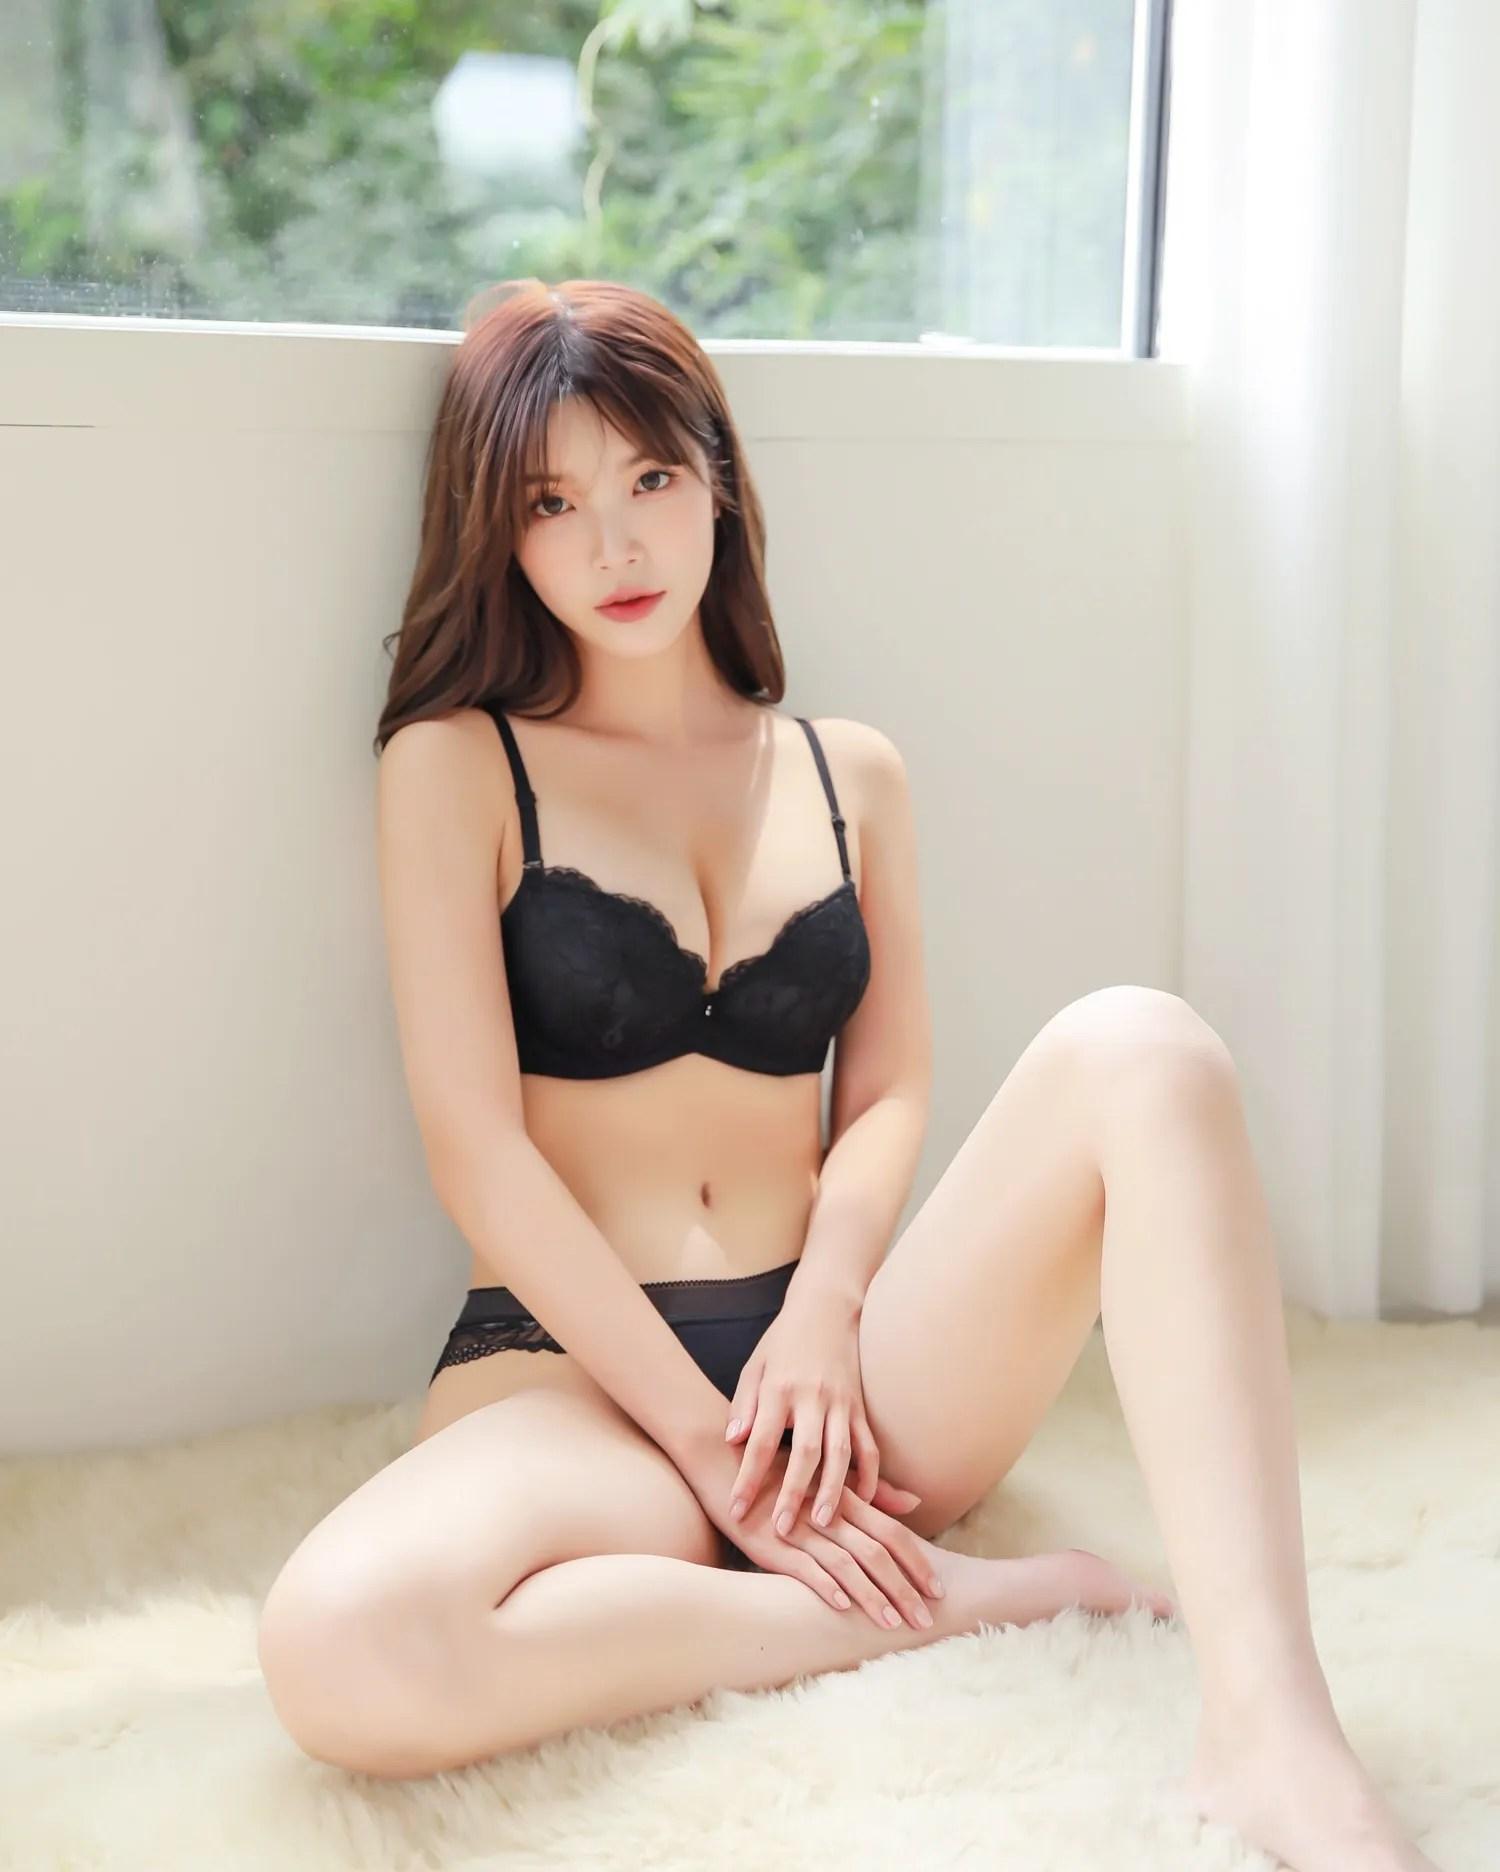 Cha Yoojin / NUDMALL / September 2021 / Romantic Lace Lingerie